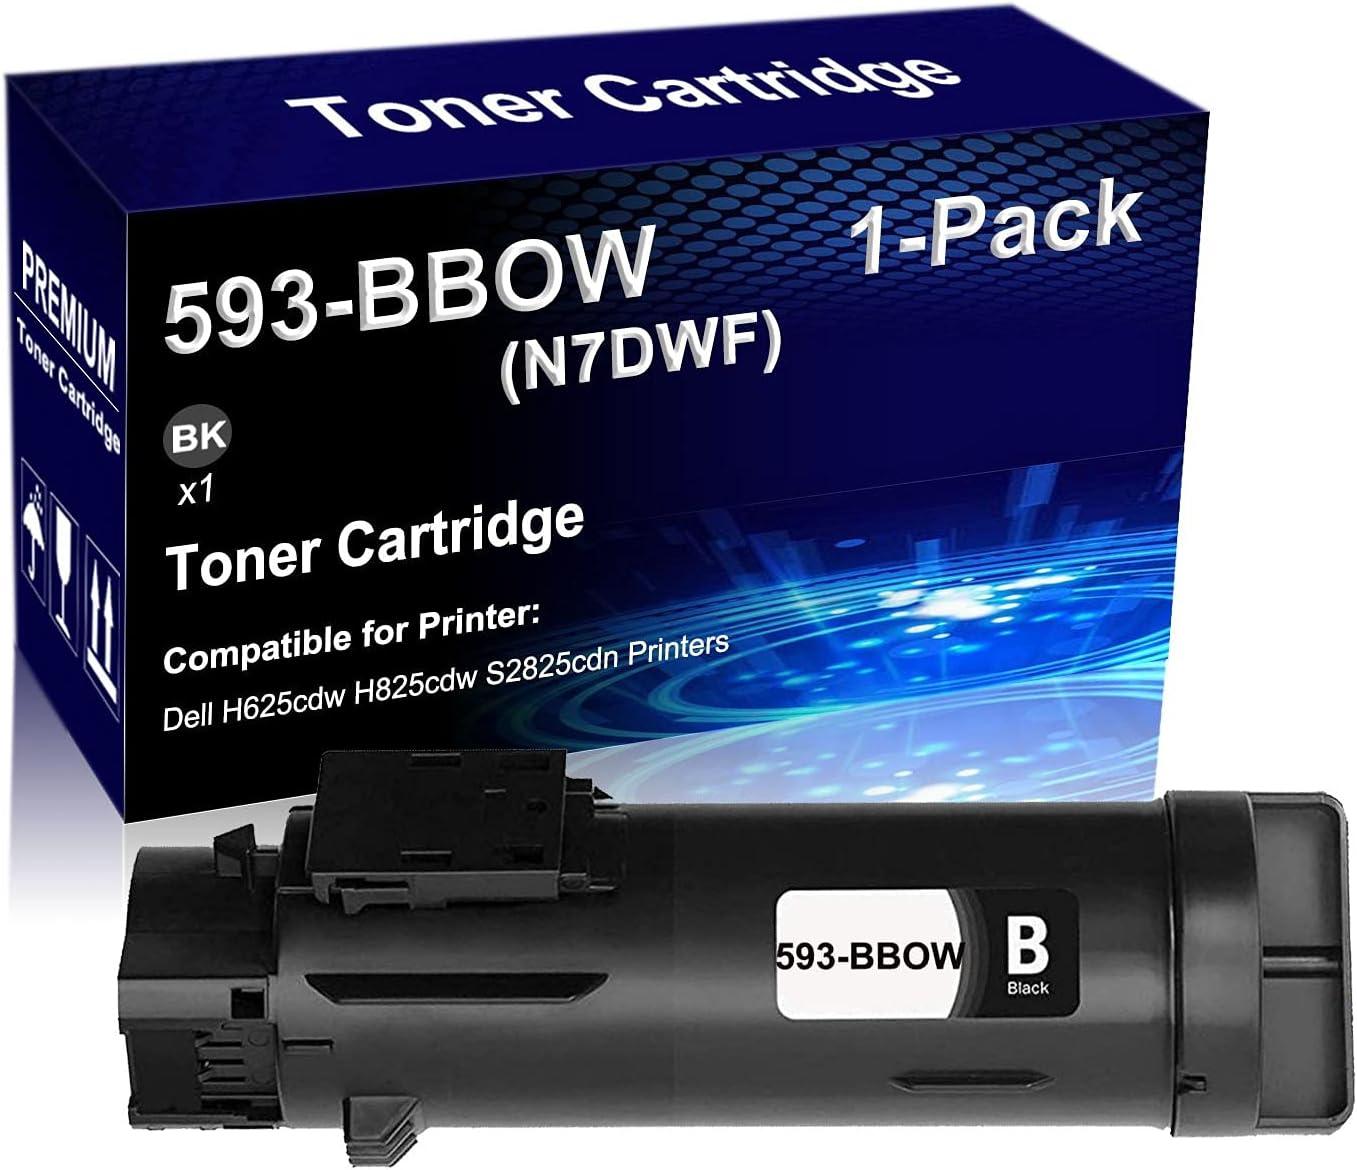 1-Pack (Black) Compatible High Yield 593-BBOW N7DWF Black Toner Cartridge use for Dell H625cdw H825cdw S2825cdn Printer (Photos-Vivid)